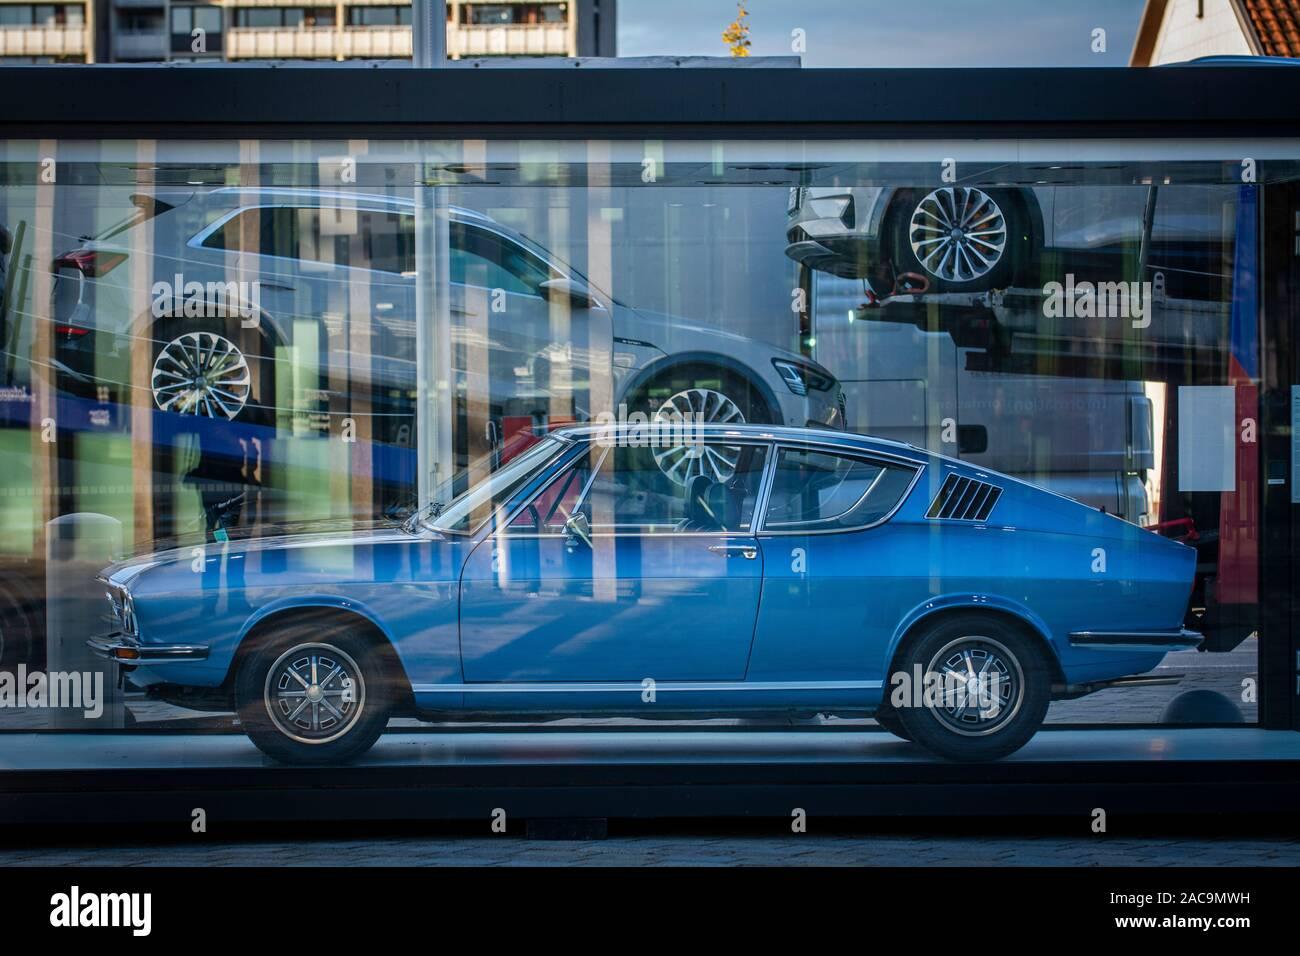 Kekurangan Audi Transporter Harga